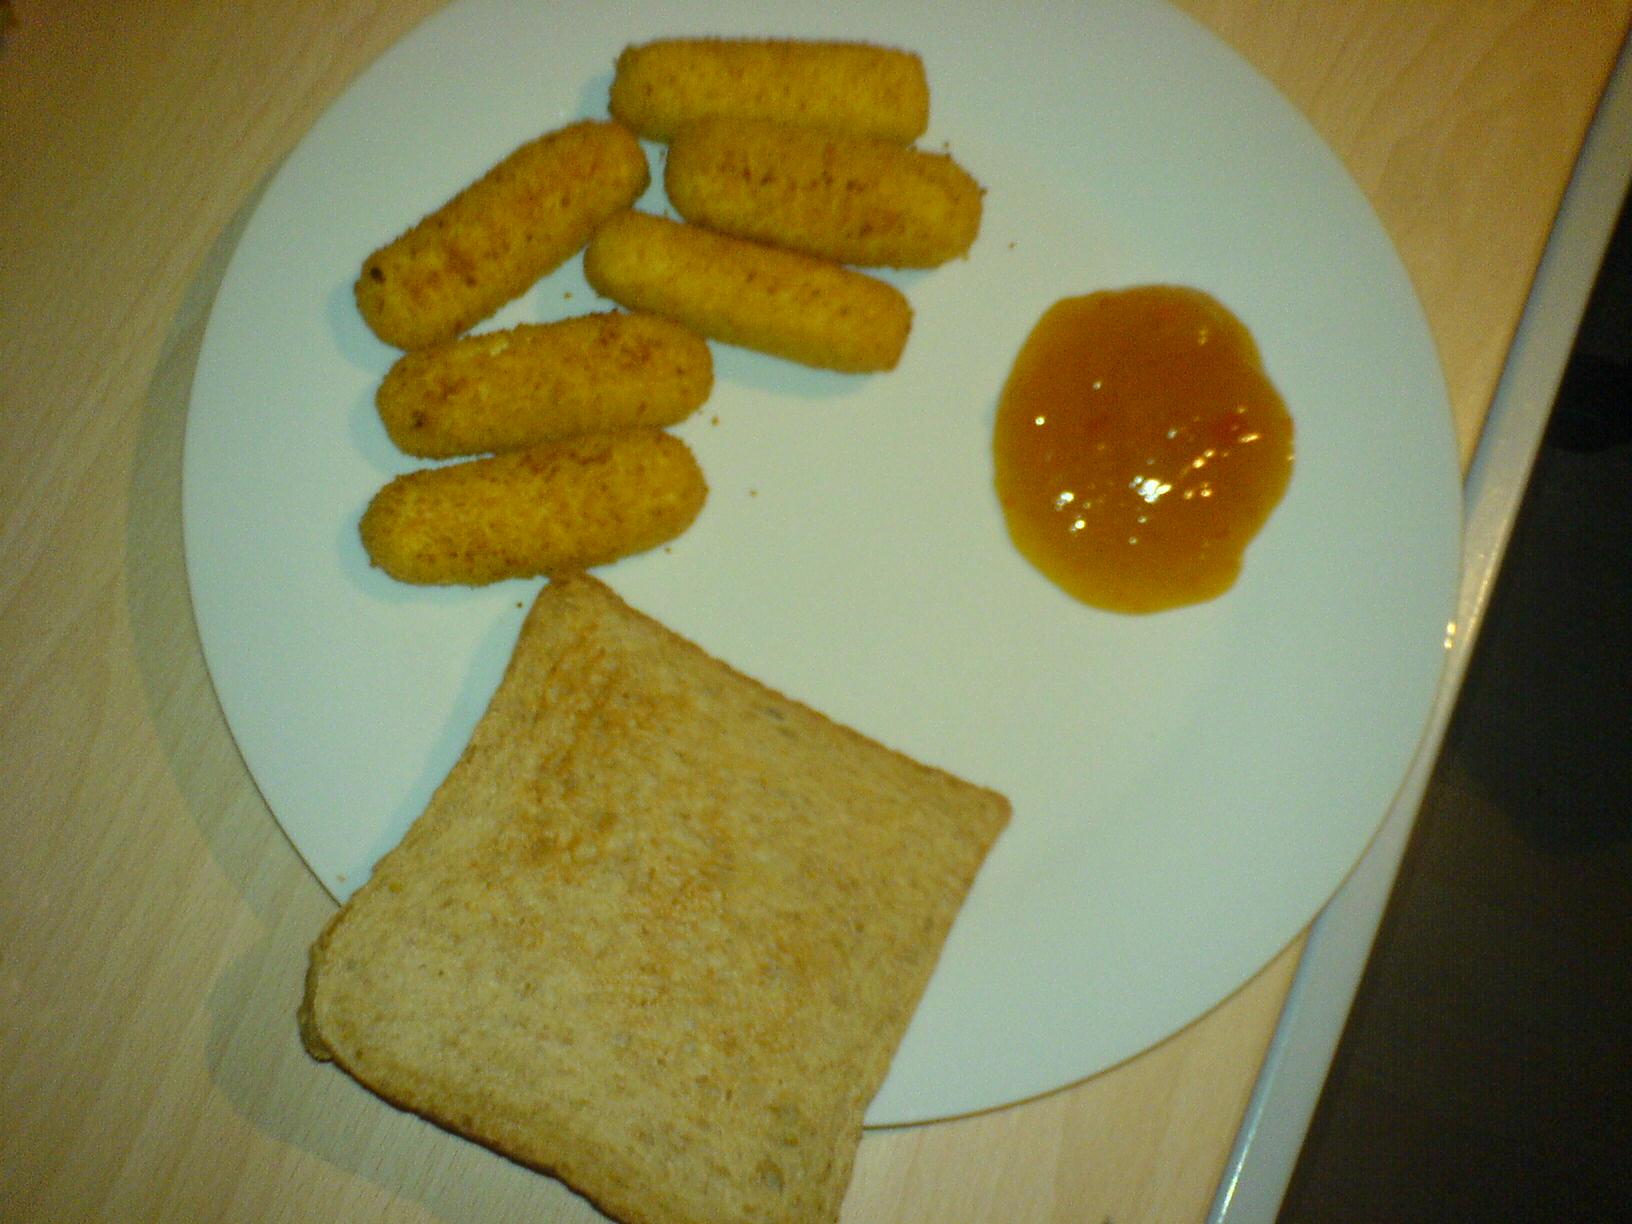 http://foodloader.net/Holz_2008-12-27_Frischkaese-Sticks_mit_Toast.jpg